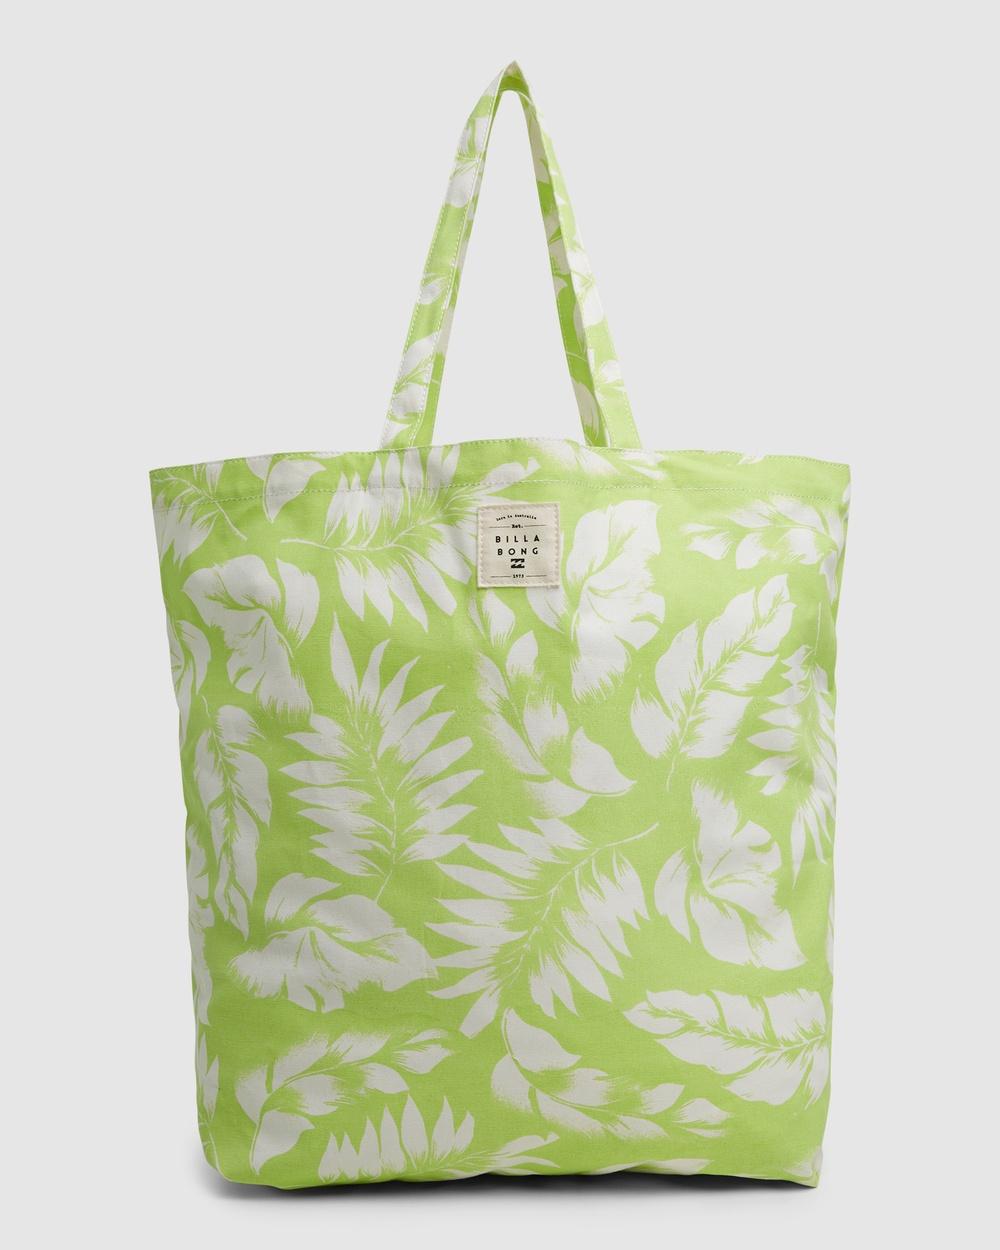 Billabong Summer Fun Carry Bag Beach Bags LIME